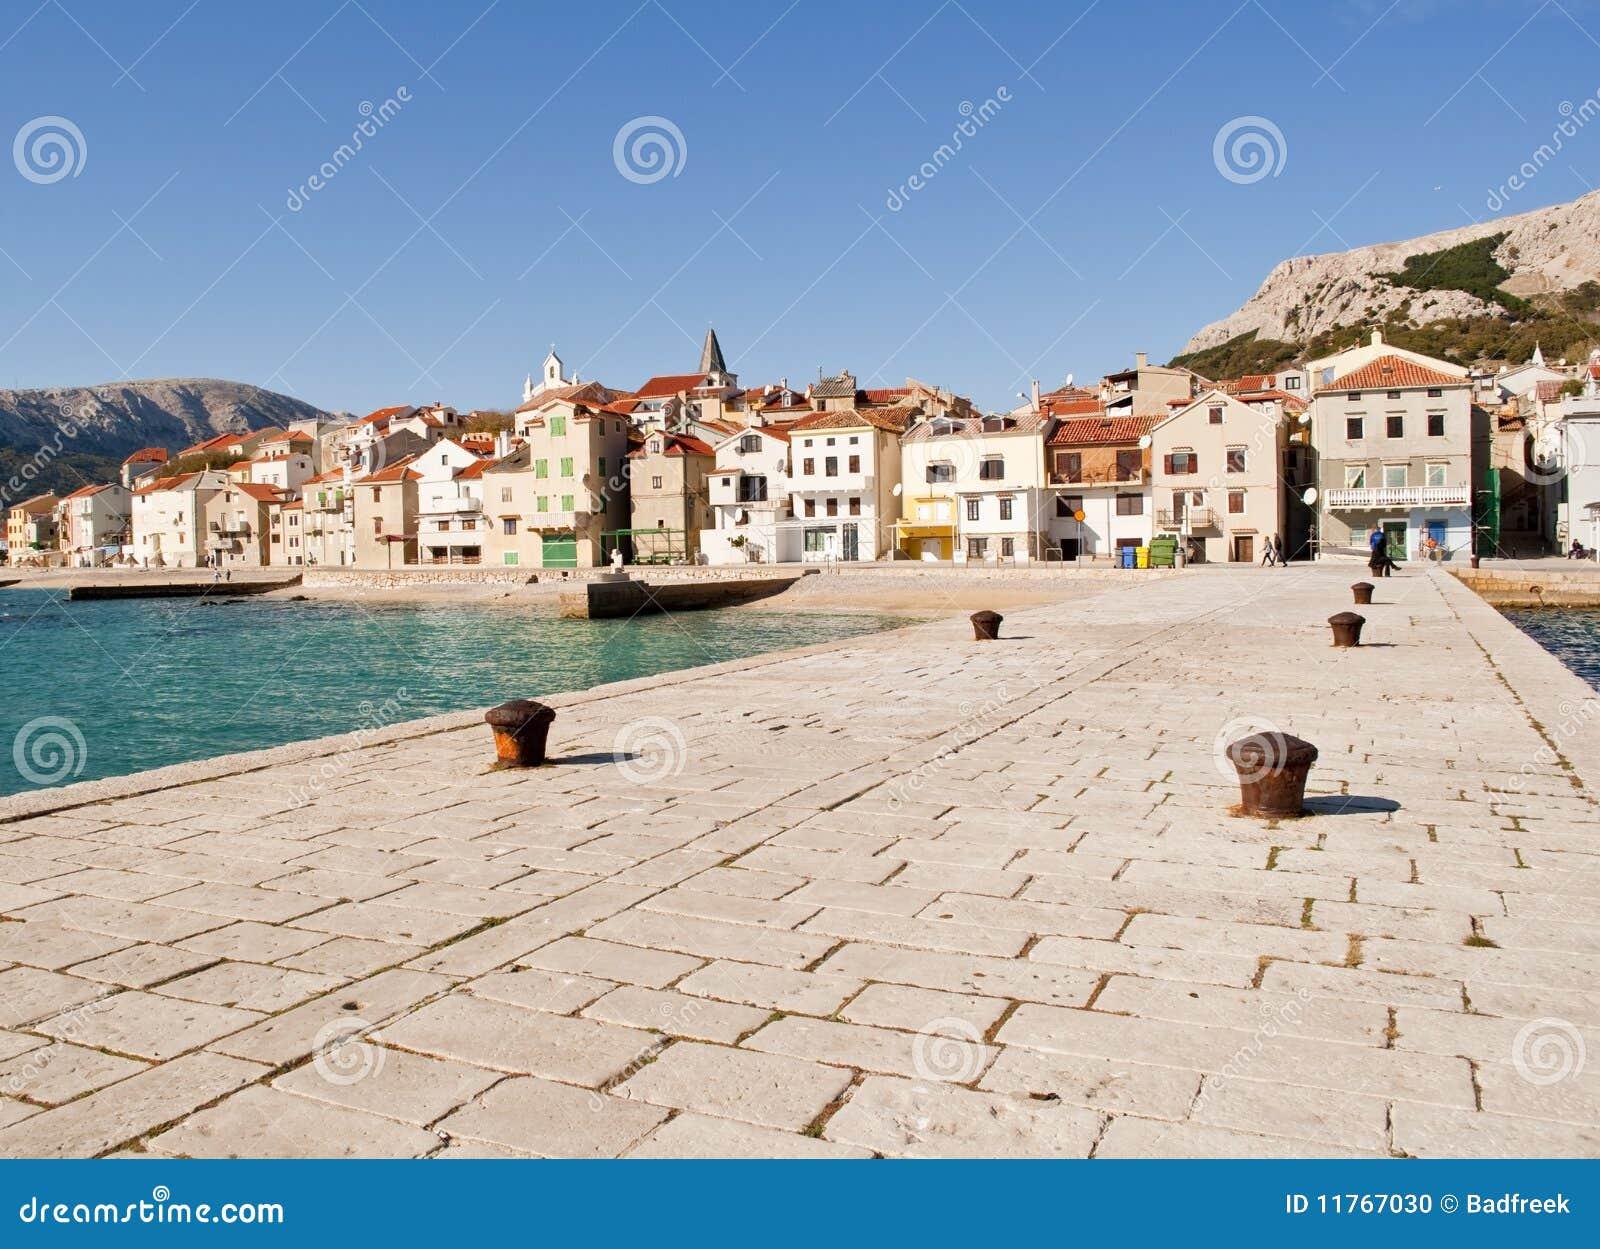 Vieille ville de bord de la mer de Baska (Krk)